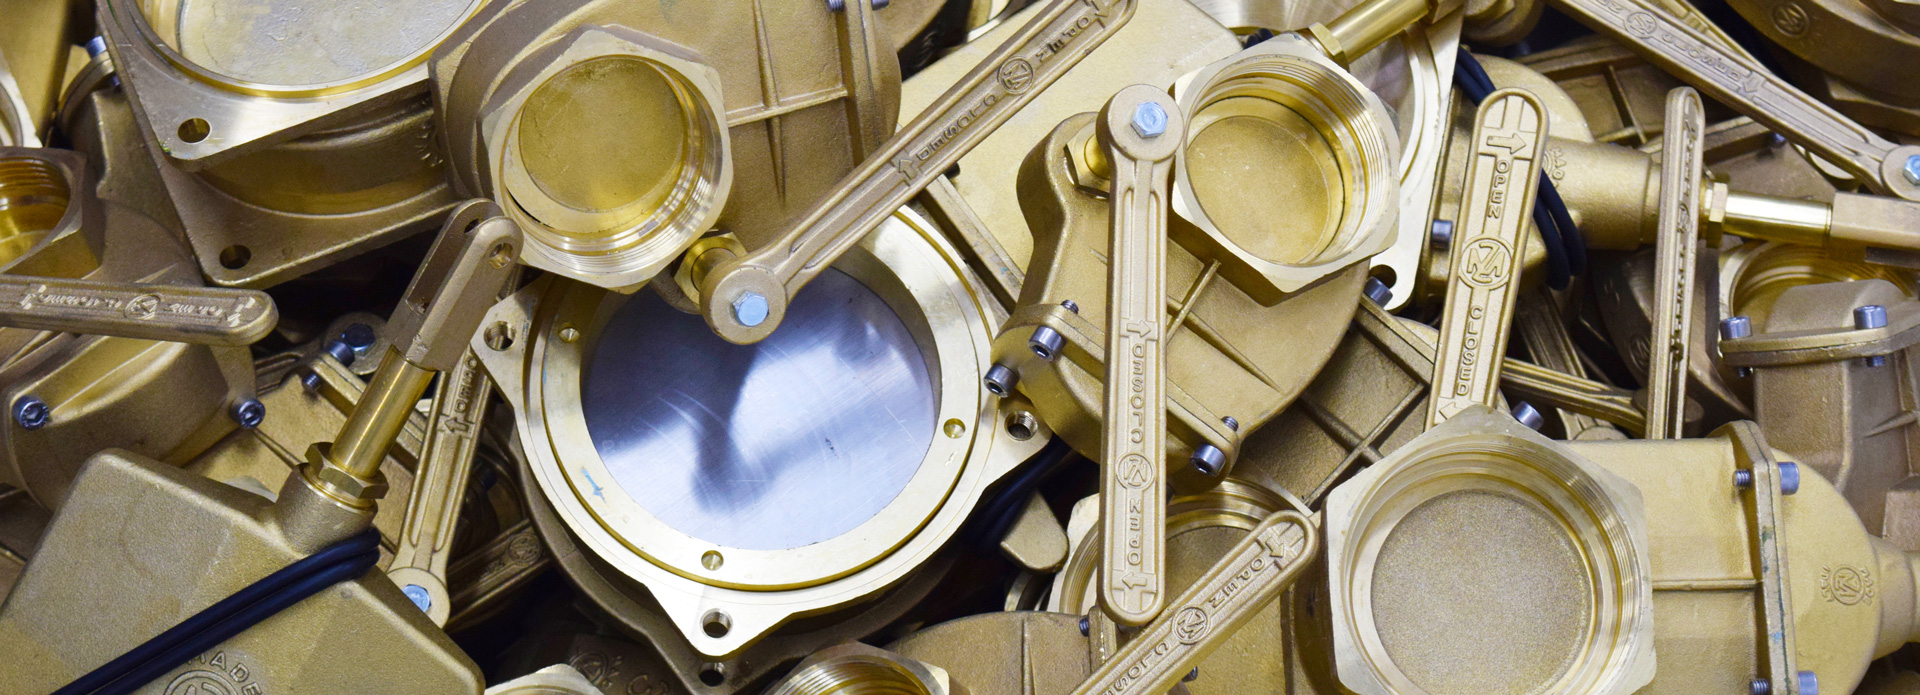 Eldon-C-Stutsman-Inc-Metaltecnica-Italian-Valves